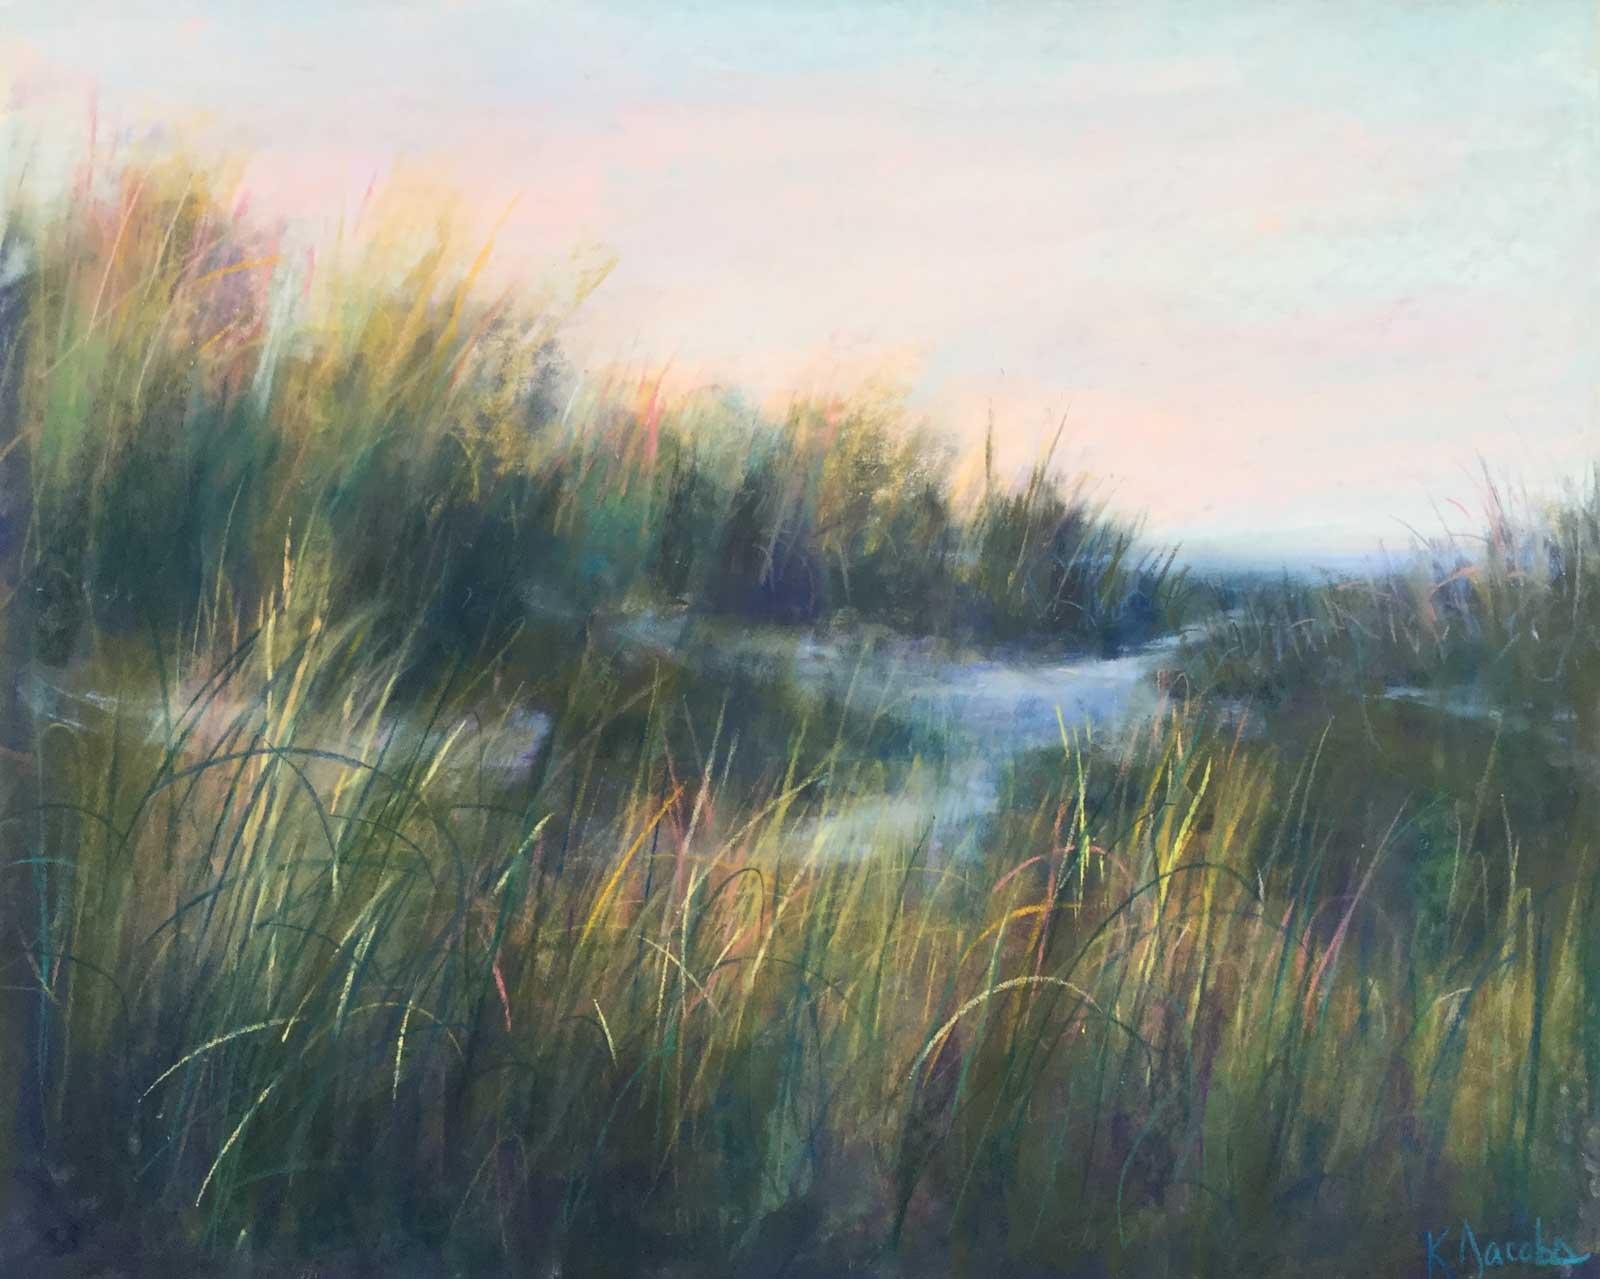 Kellie Jacobs, Carolina Beach at Dusk, Pastel, 18x24